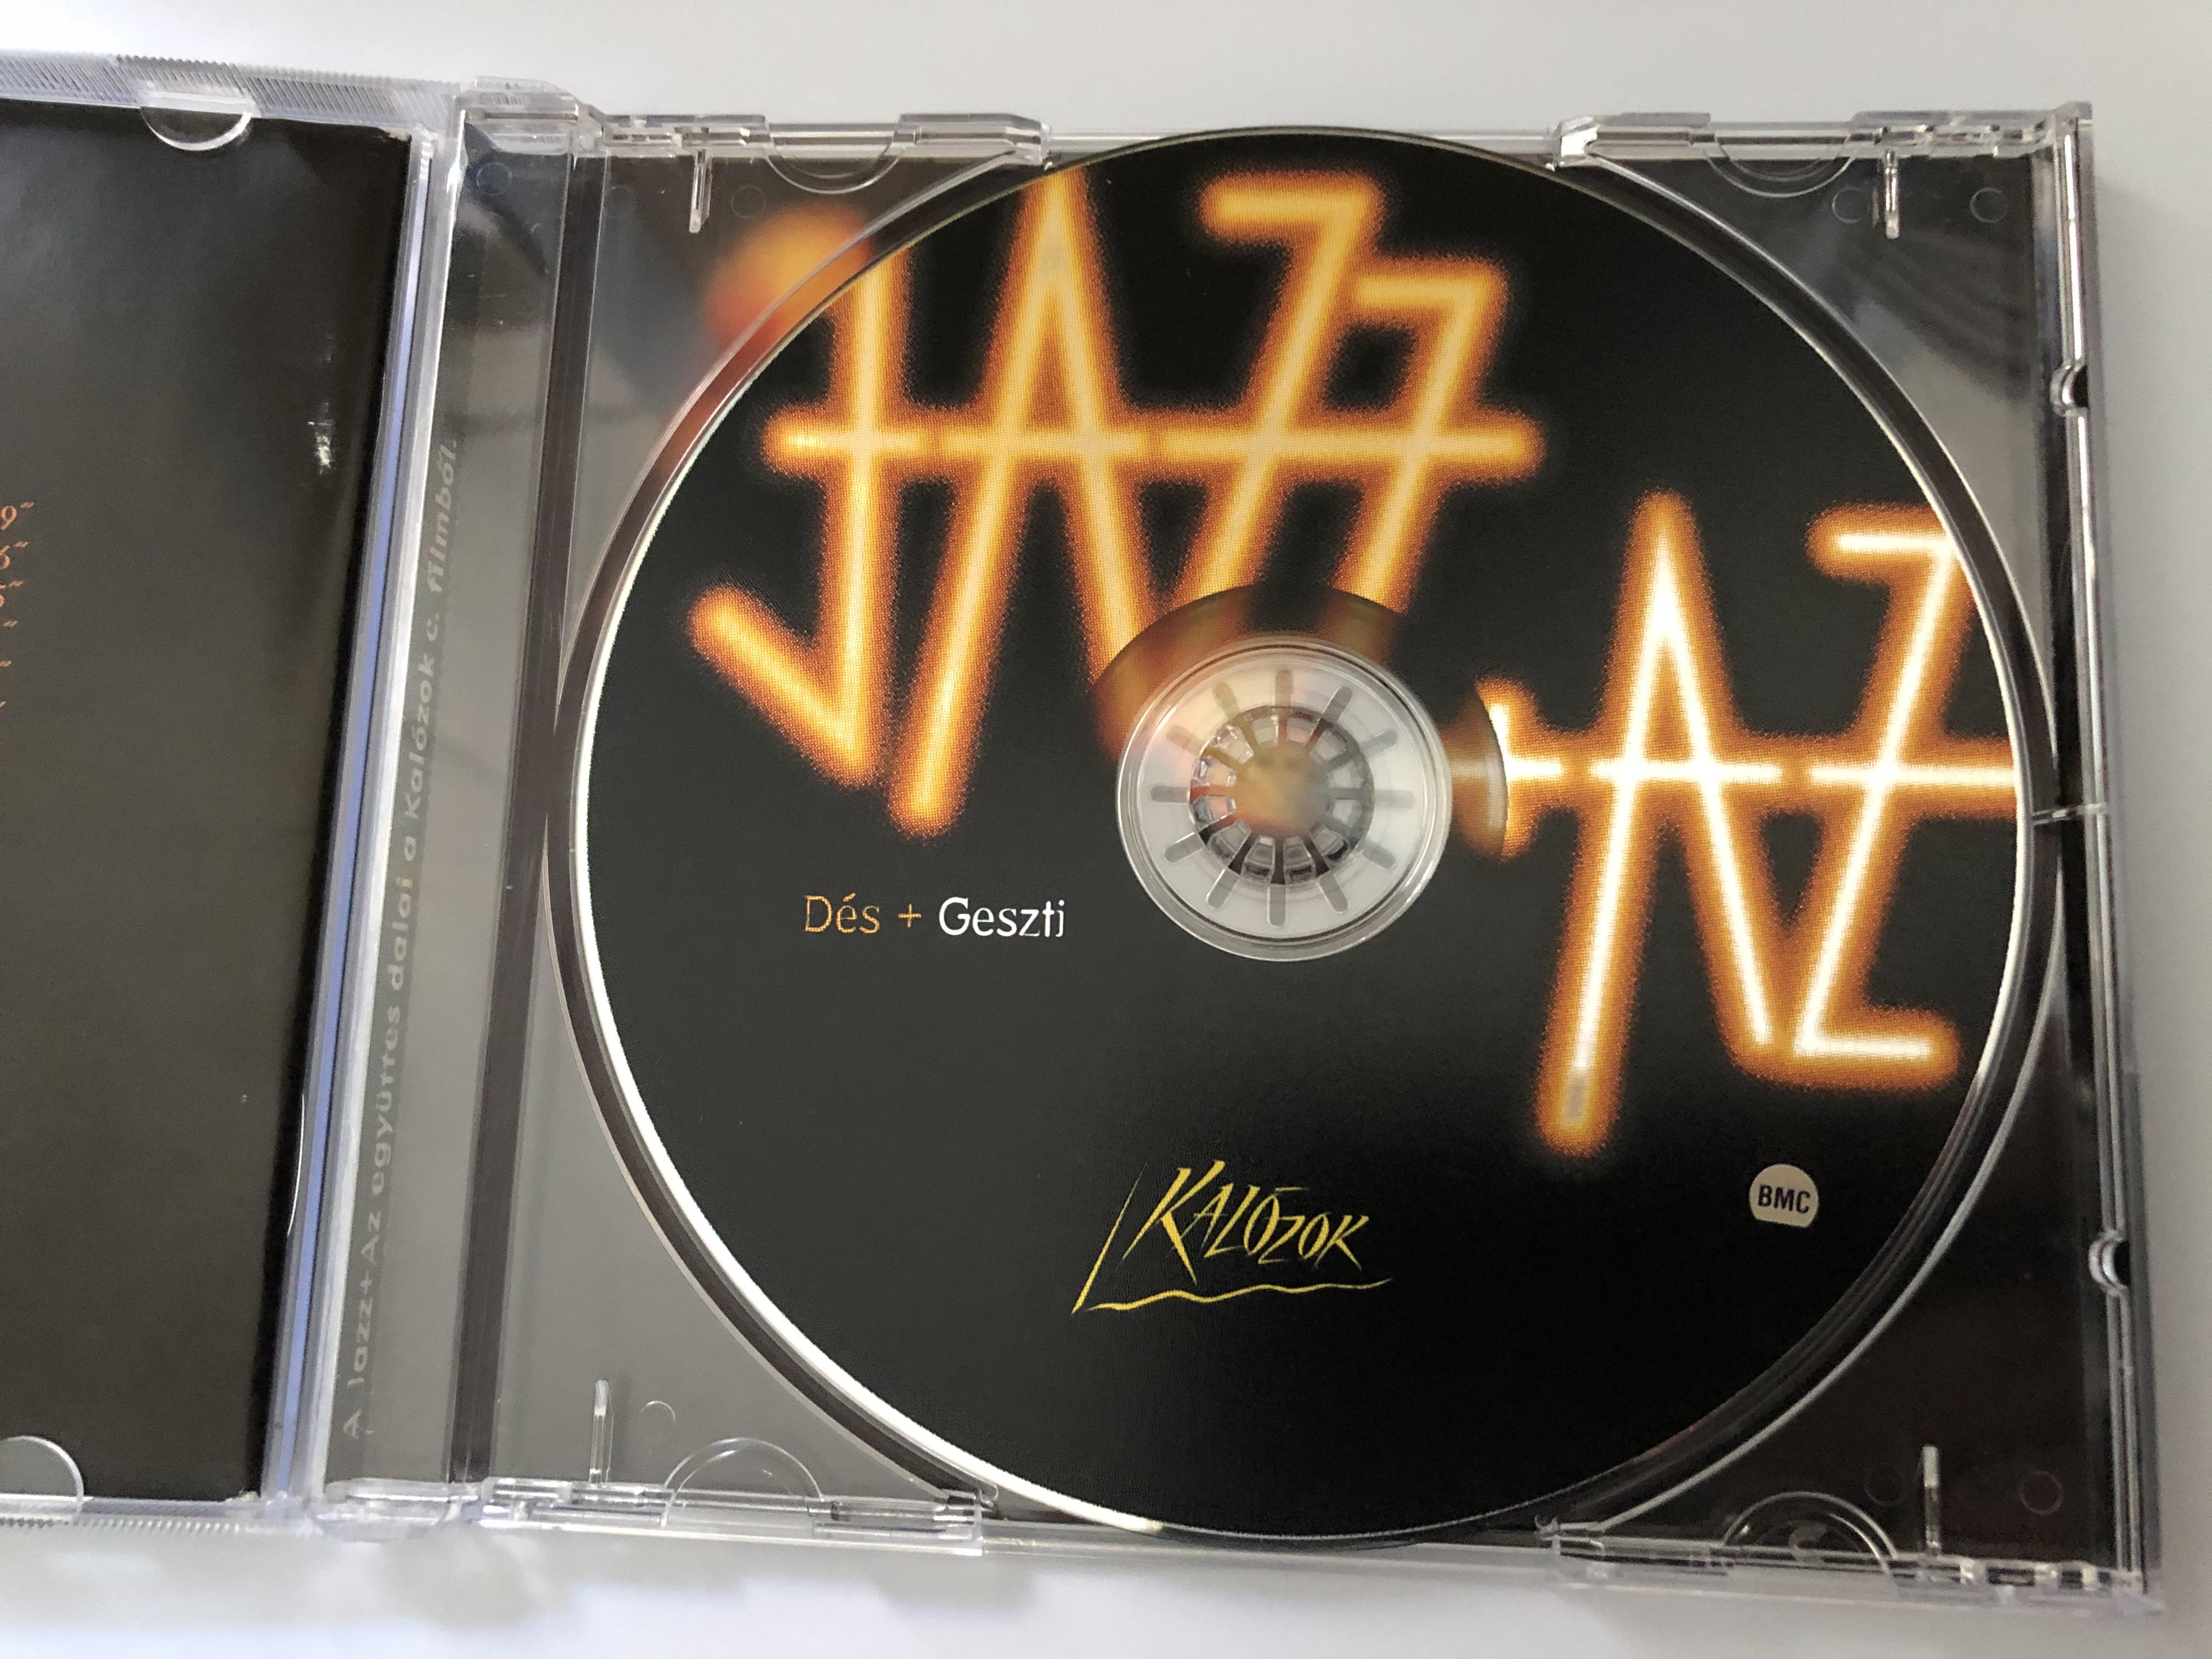 d-s-geszti-jazz-az-kal-zok-budapest-music-center-records-audio-cd-1998-bmc-cd-016-9-.jpg